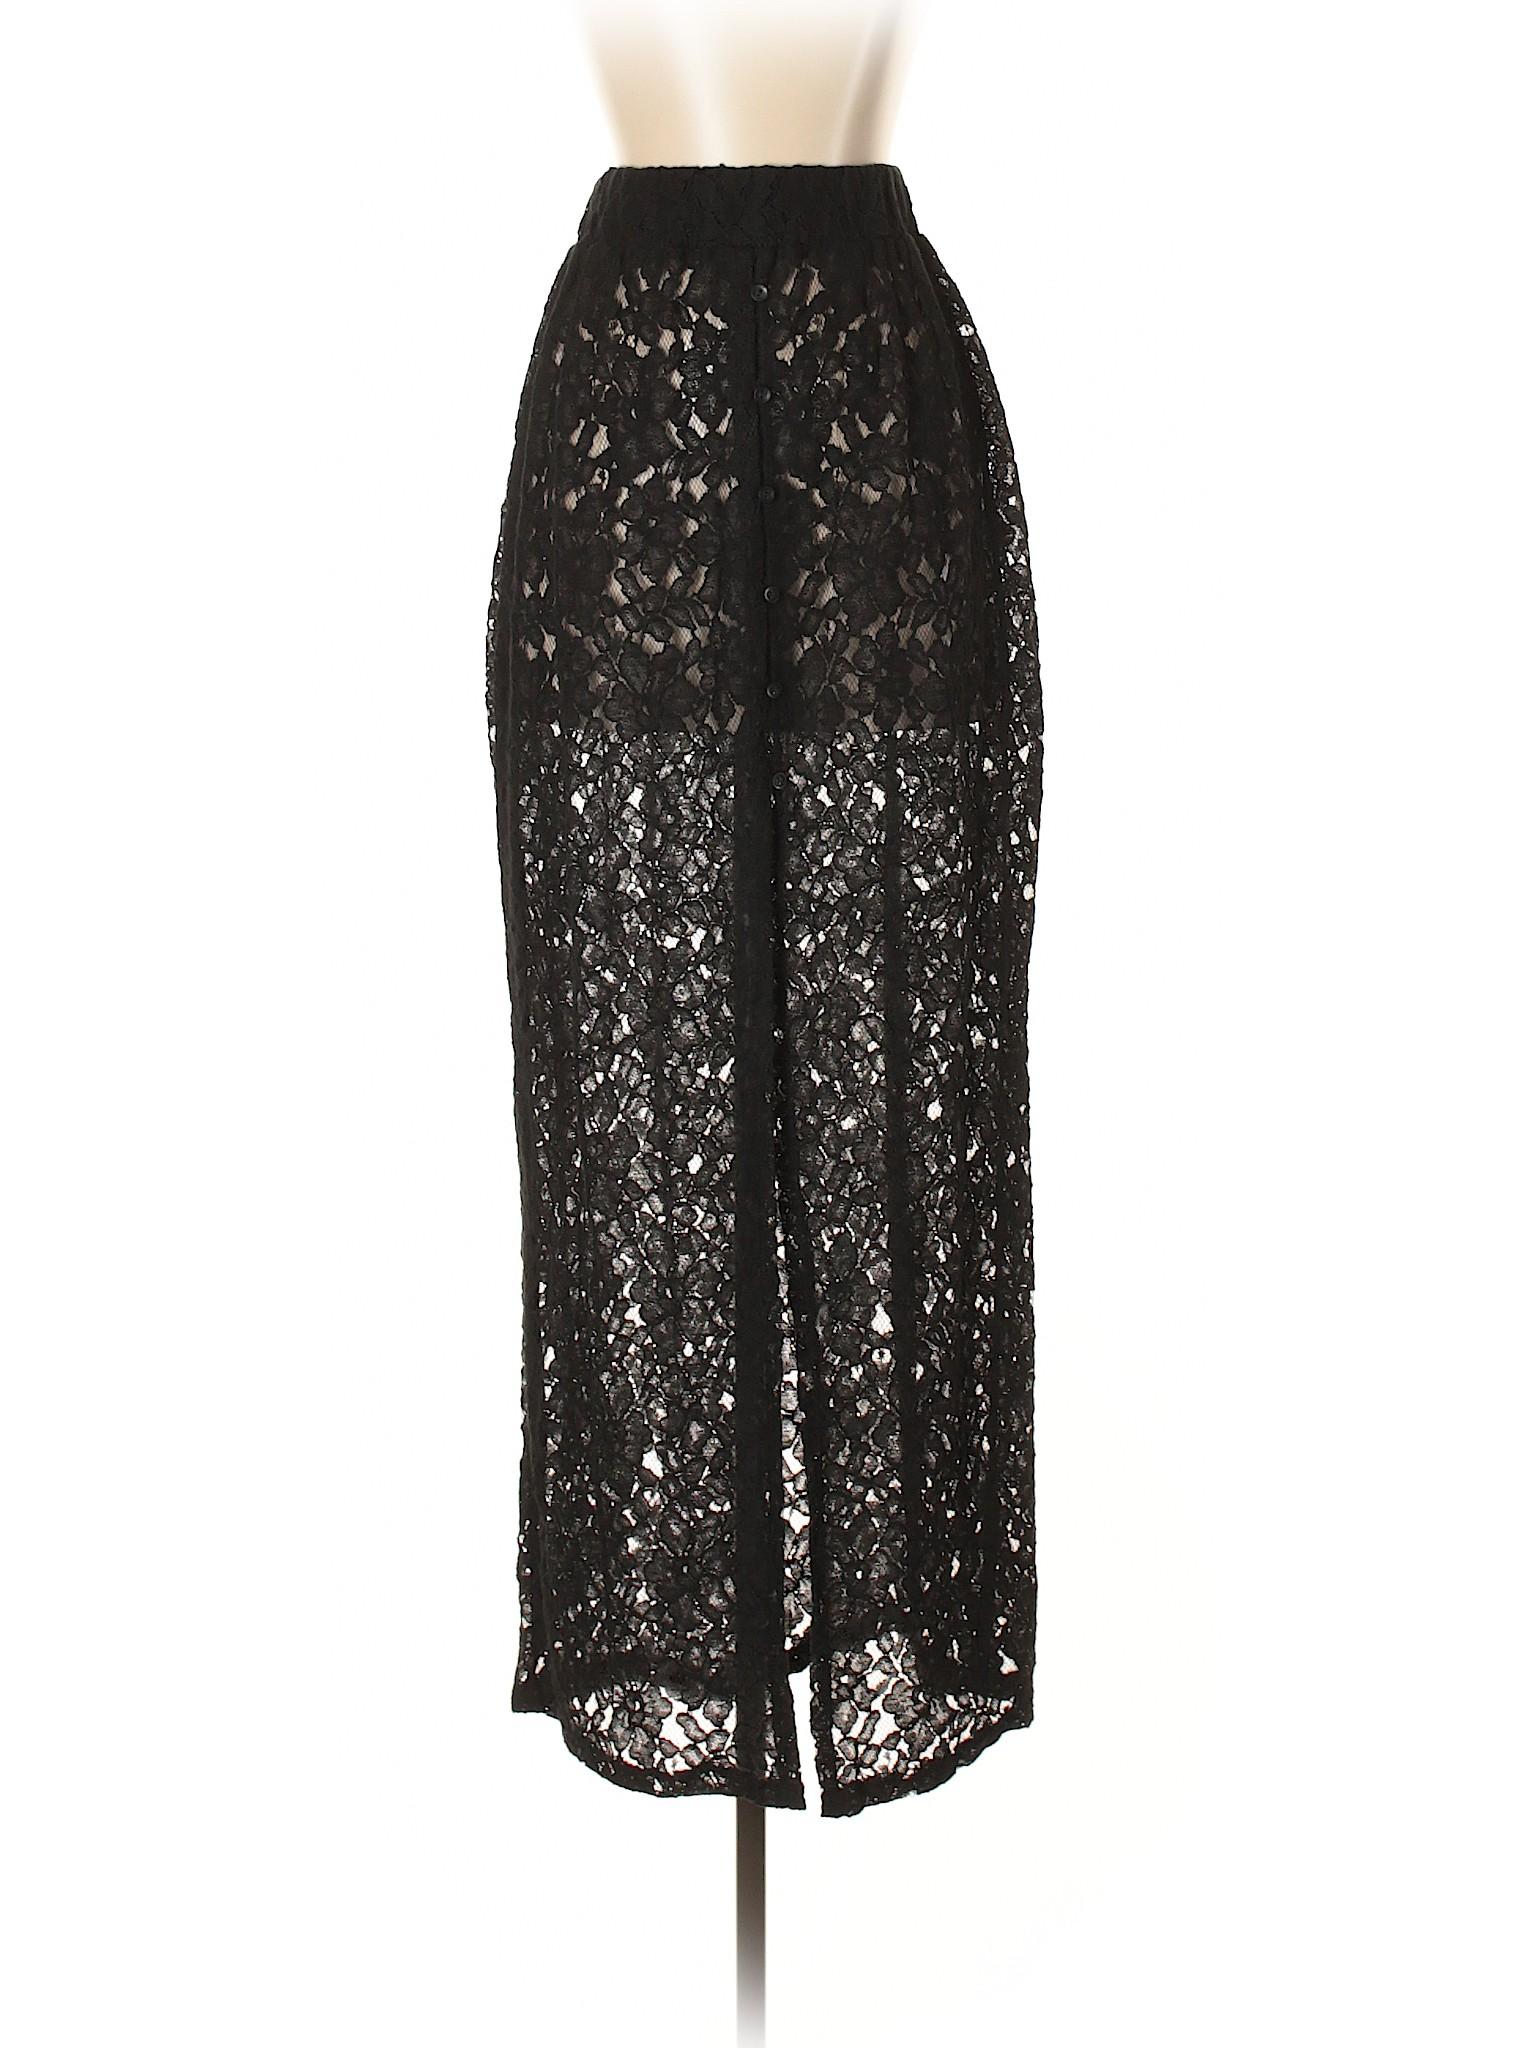 Casual Boutique Boutique Skirt Boutique Casual Skirt Skirt Casual wIIqS5